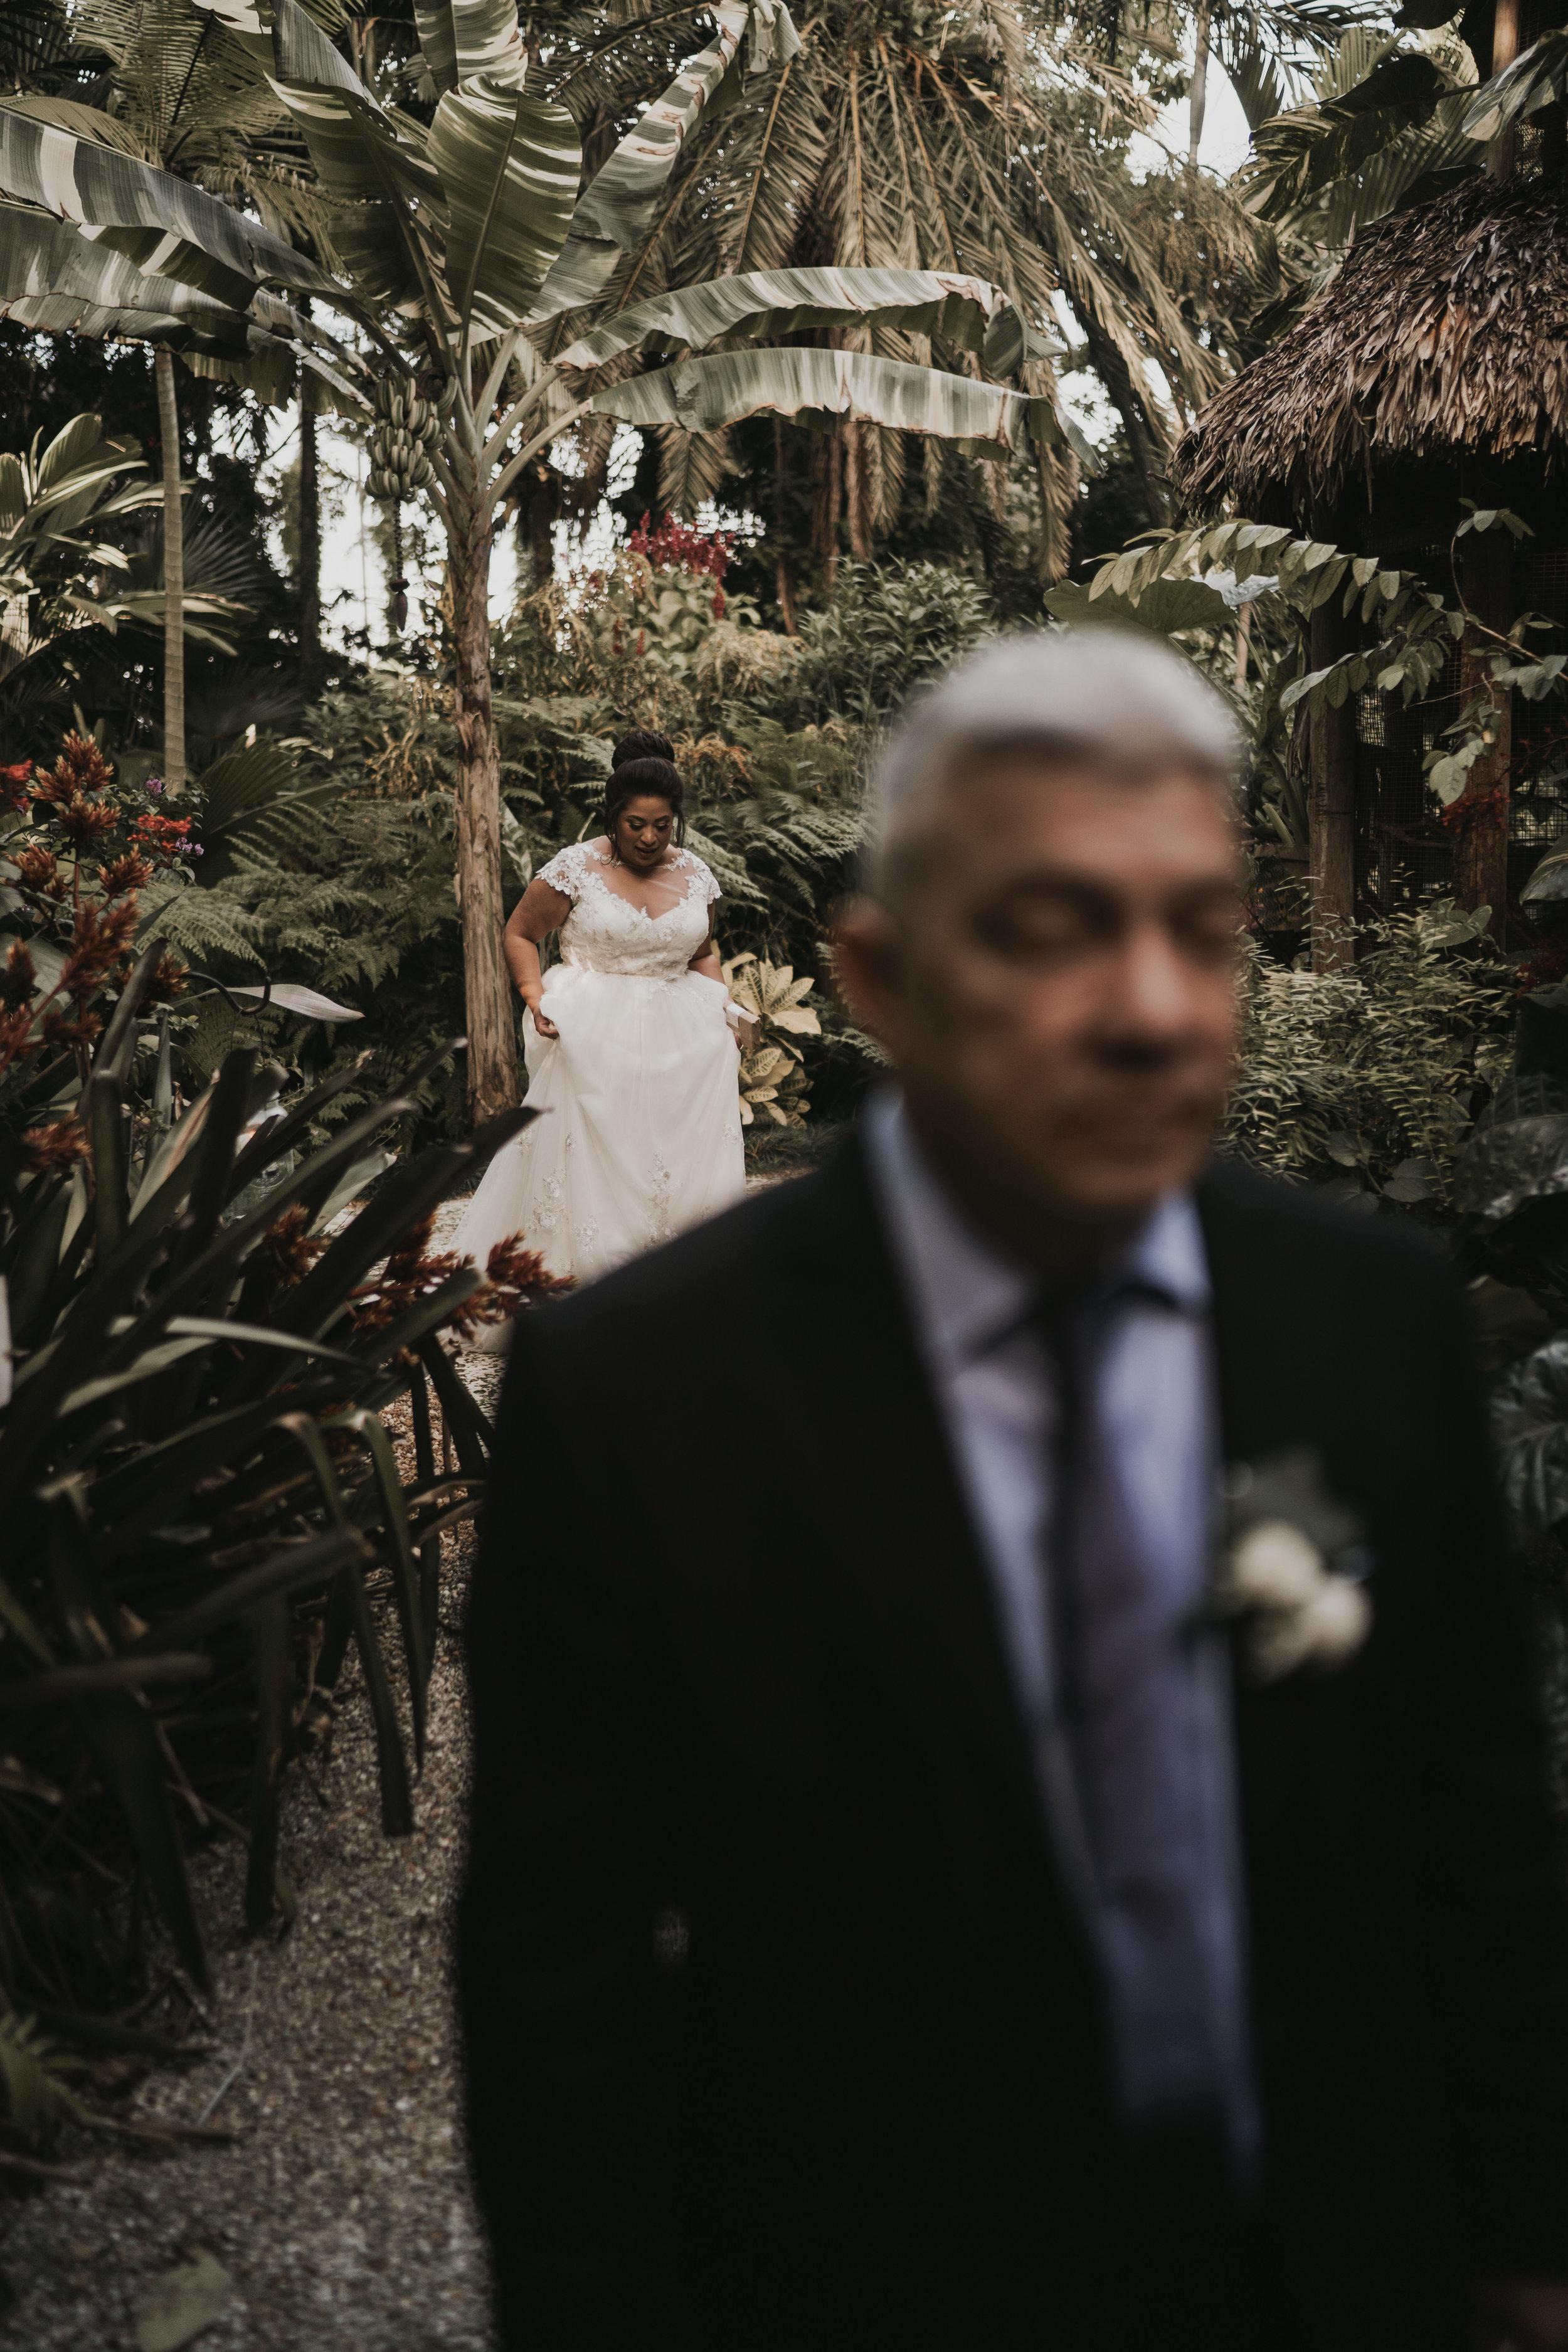 223MICHI&GABEWEDDINGDAY(WeddingFinal).jpg